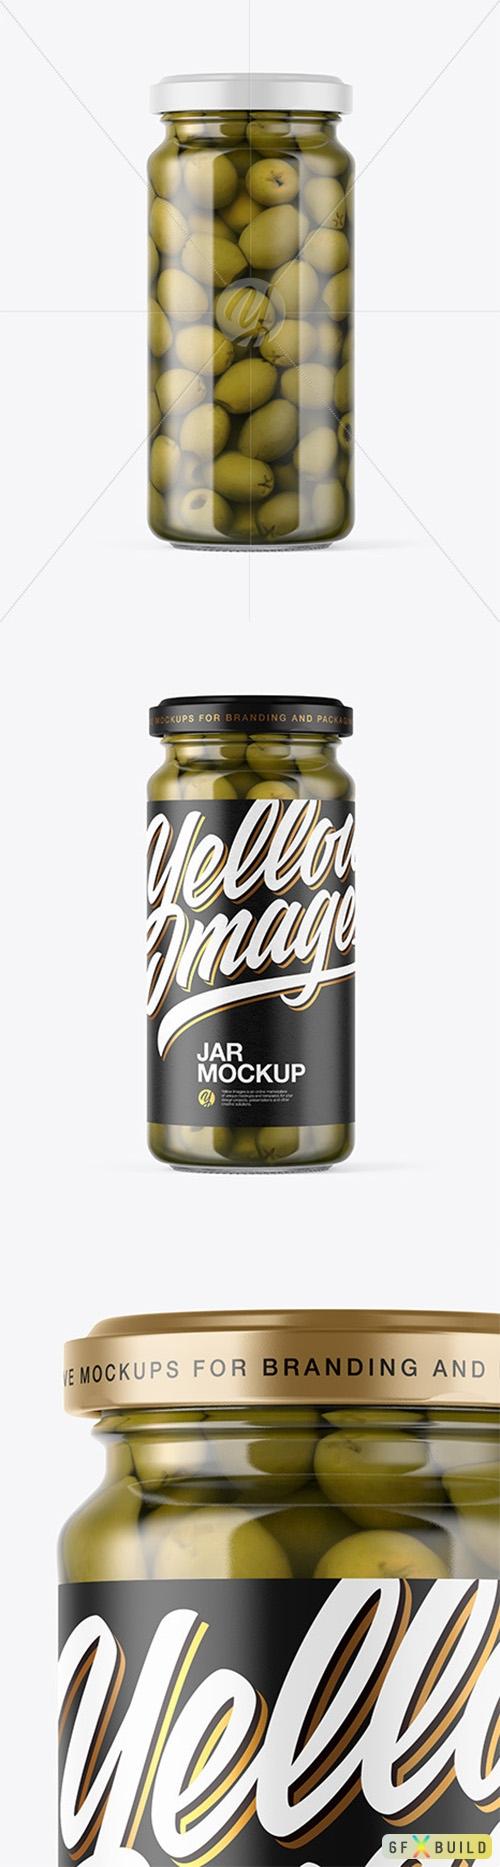 Clear Glass Jar with Olives Mockup 53307 TIF